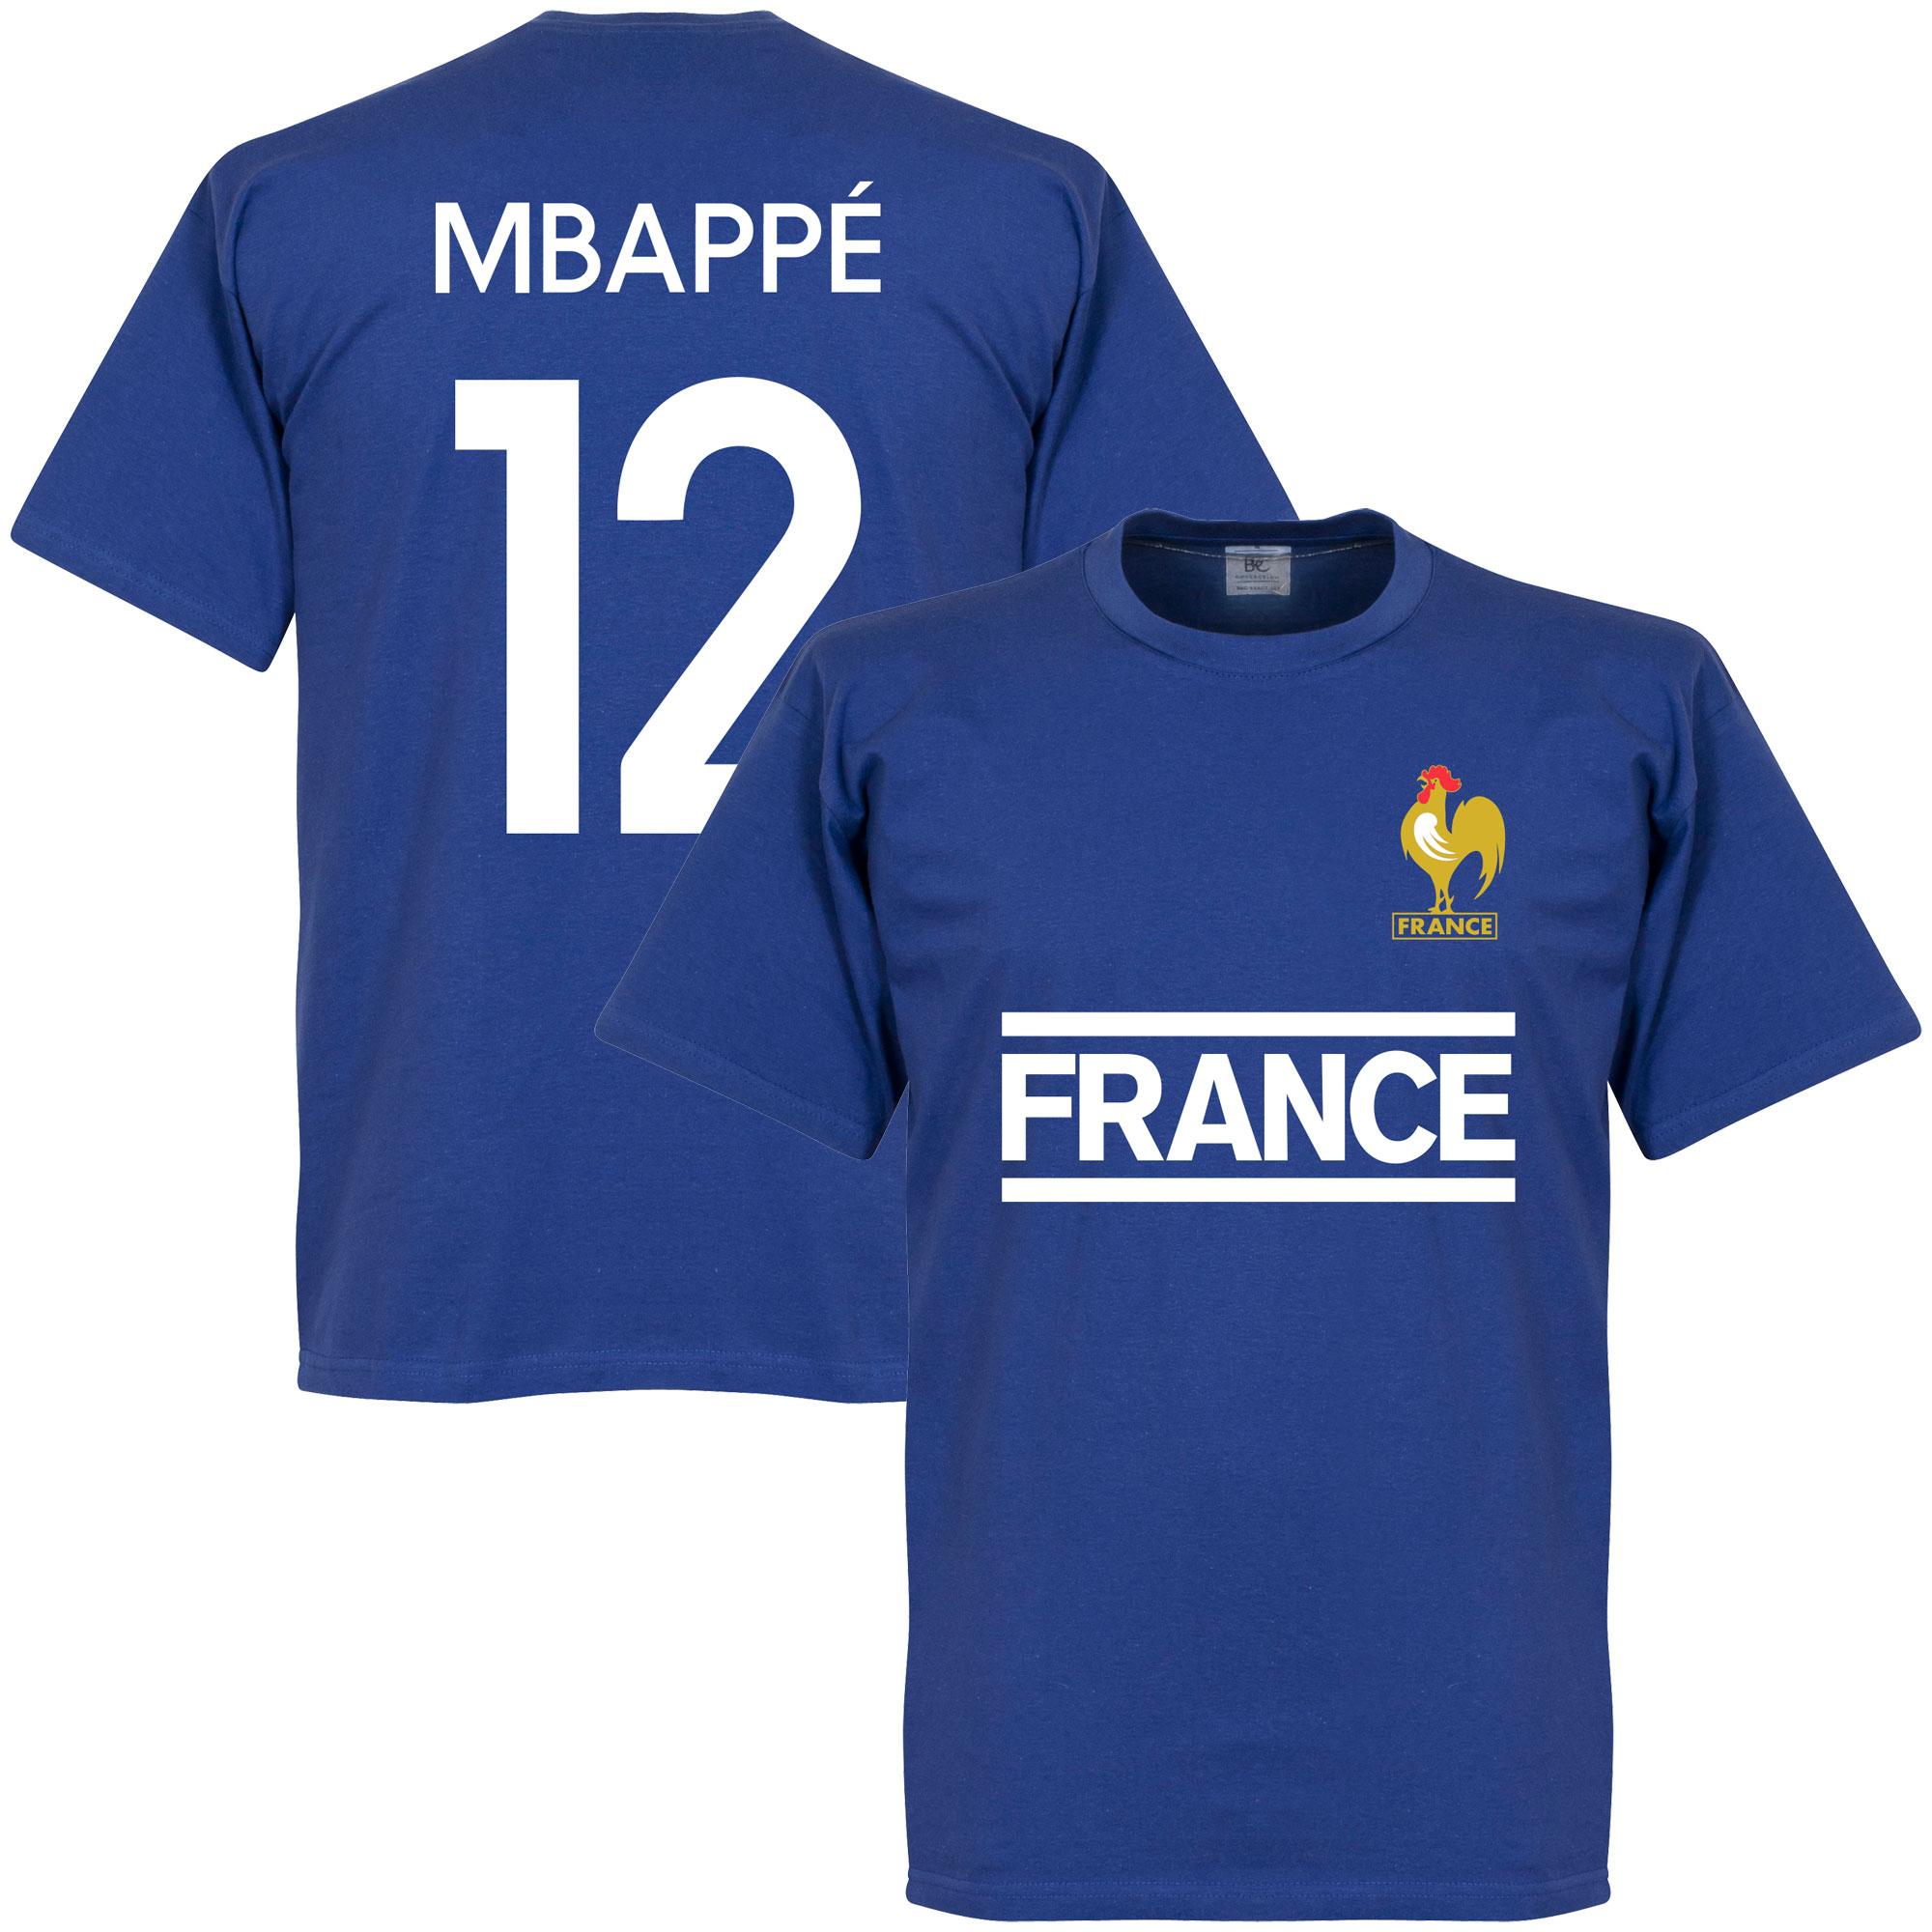 France Mbappe Team Tee - Royal - S